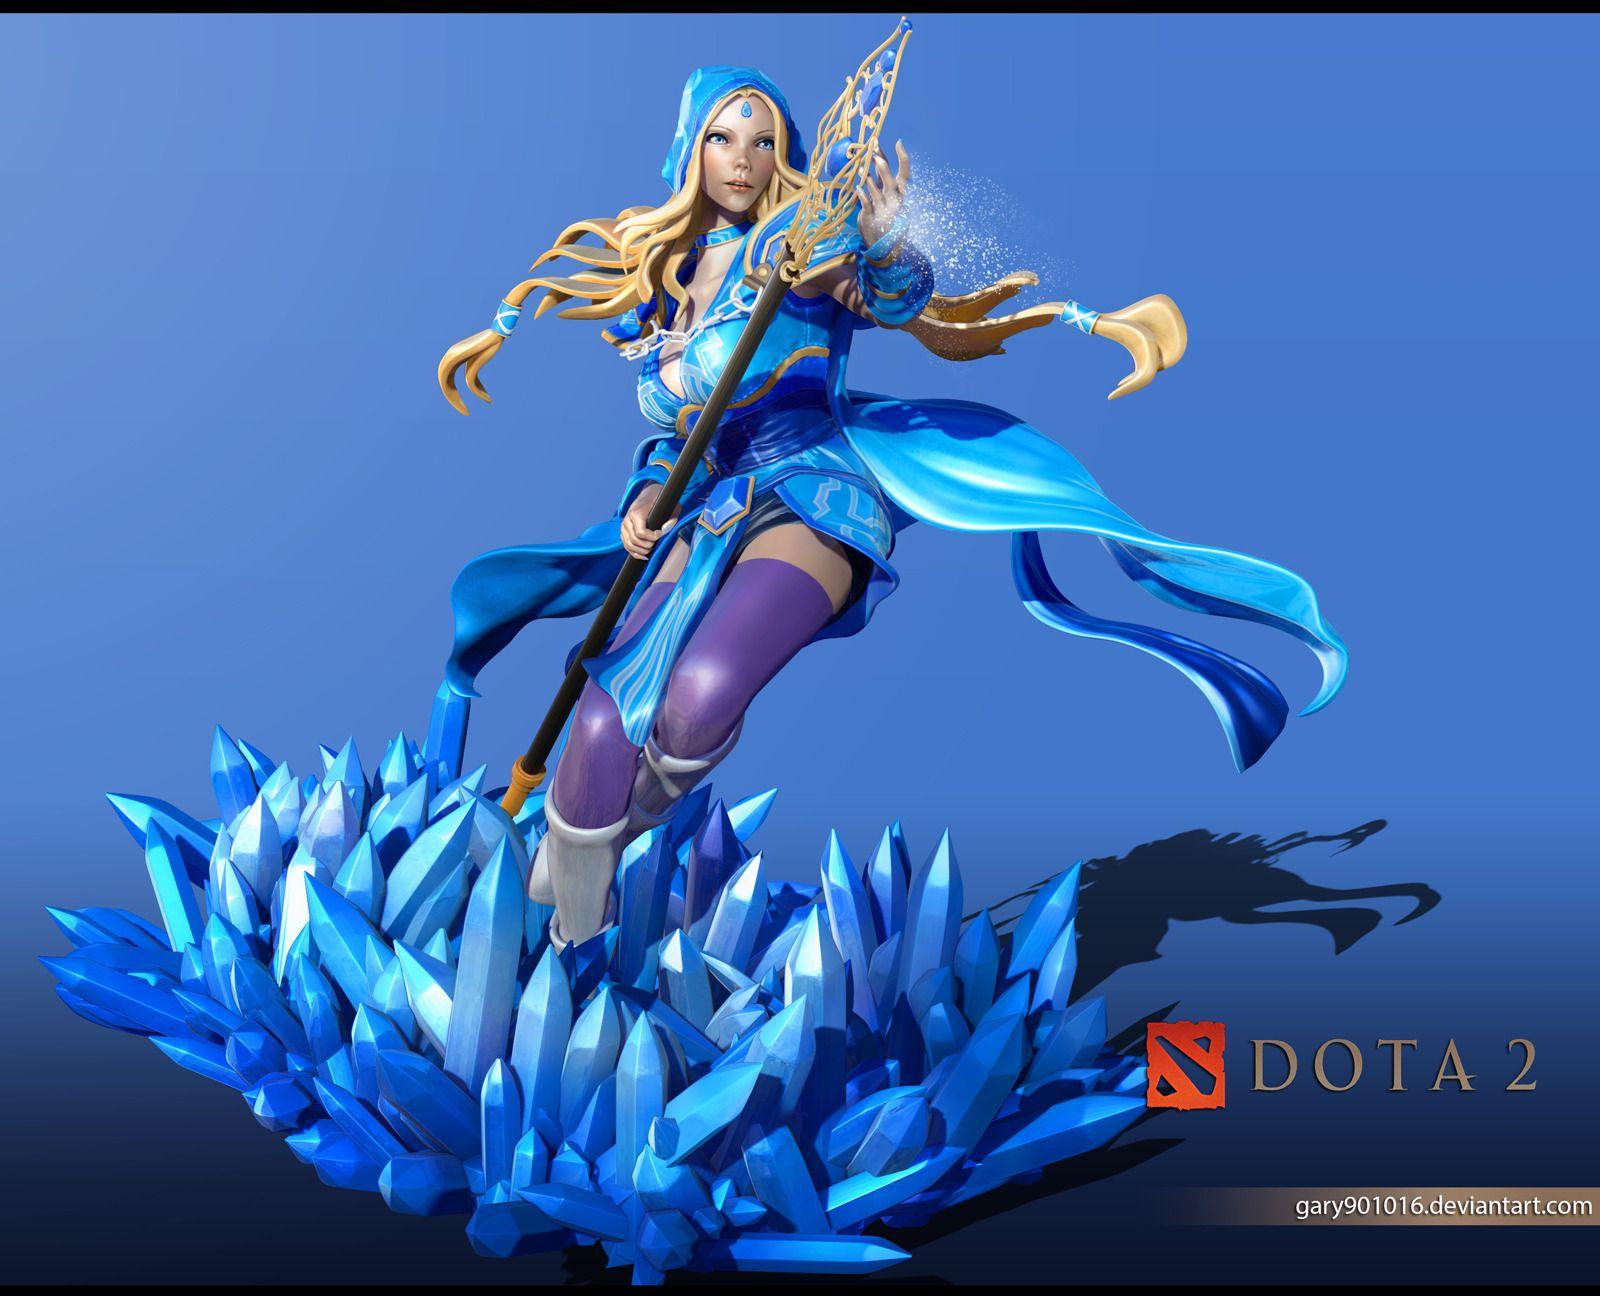 ShareDota Wallpaper Crystal Maiden